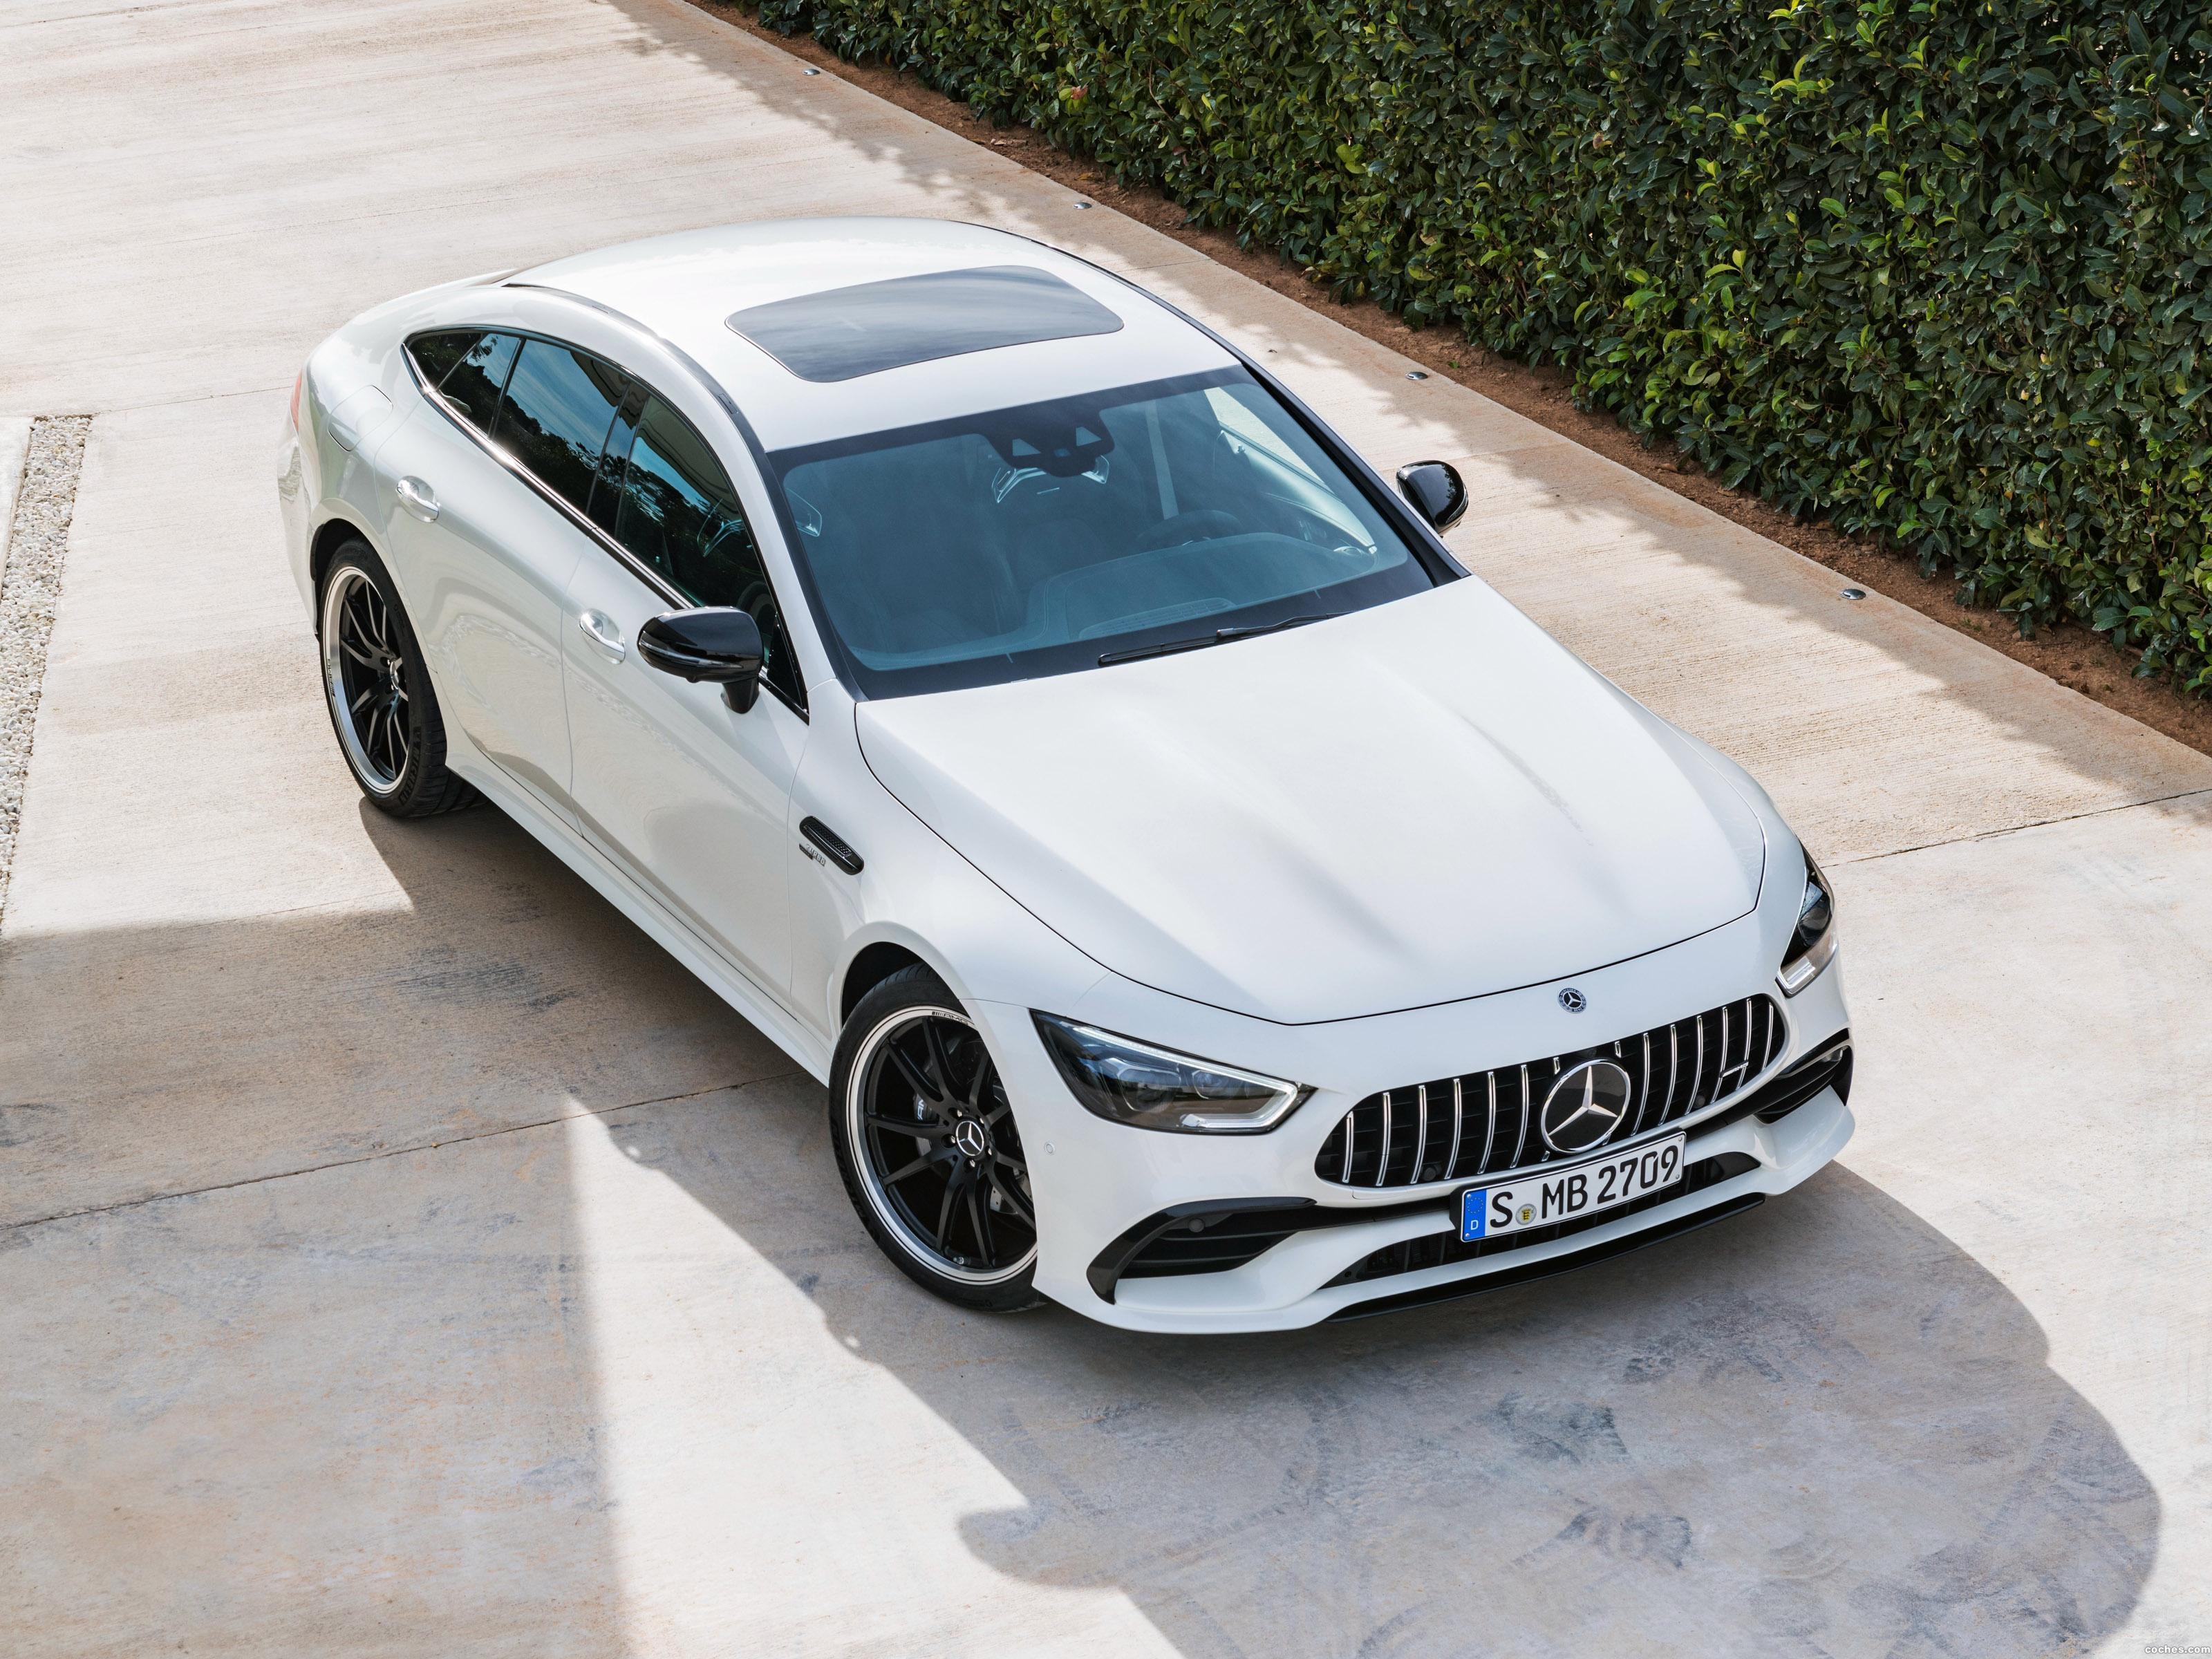 Foto 0 de Mercedes AMG GT 53 4MATIC 4 puertas Coupe 2018